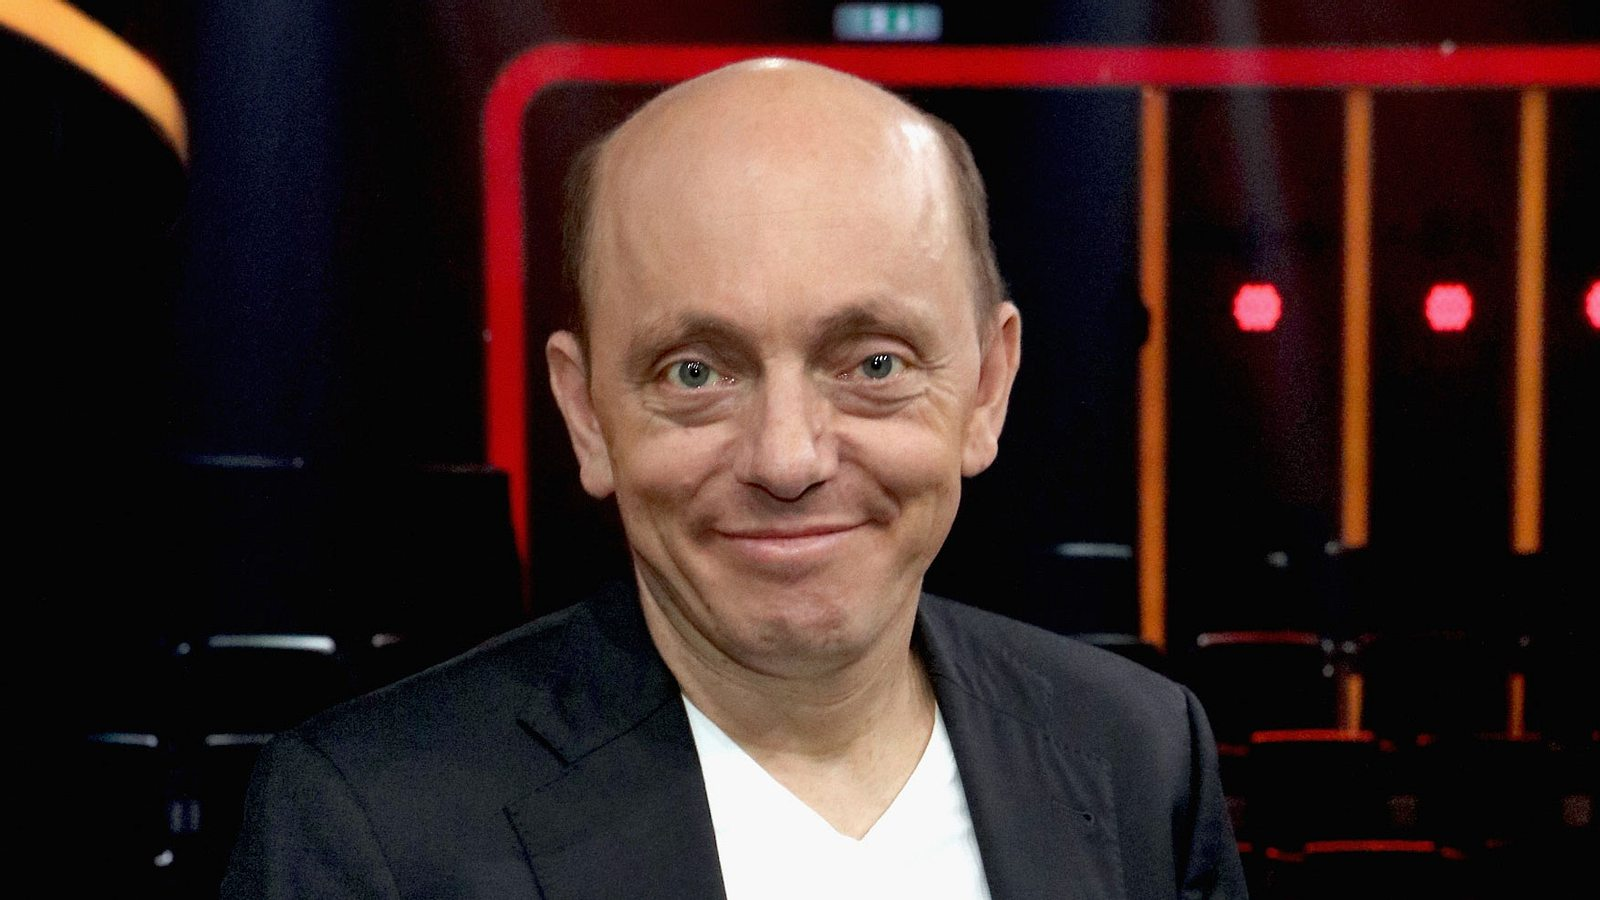 Bernhard Hoeker